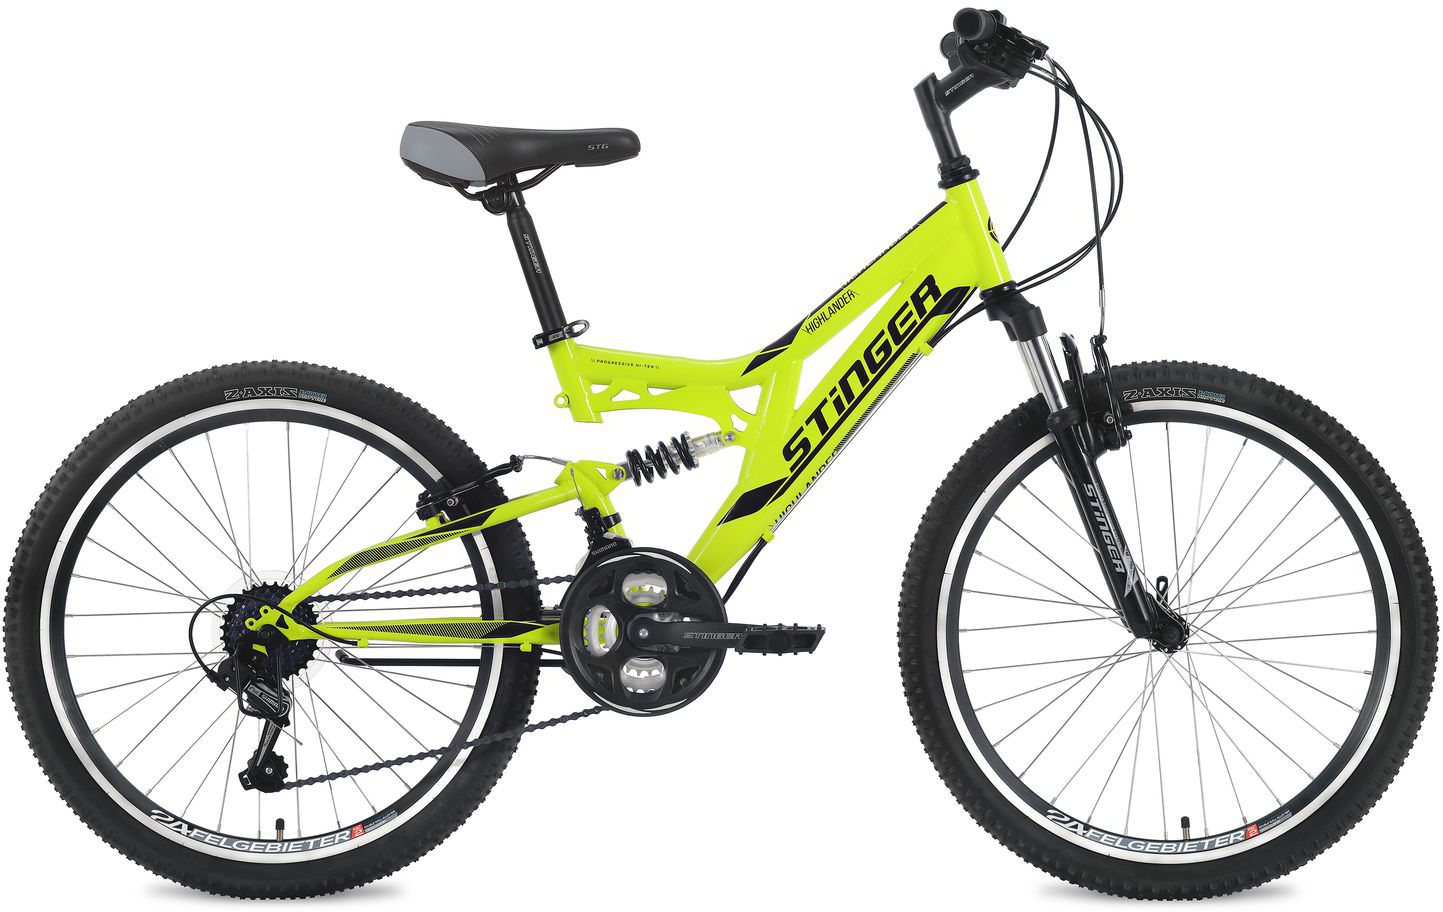 Велосипед горный Stinger Highlander, цвет: зеленый, 24, рама 14